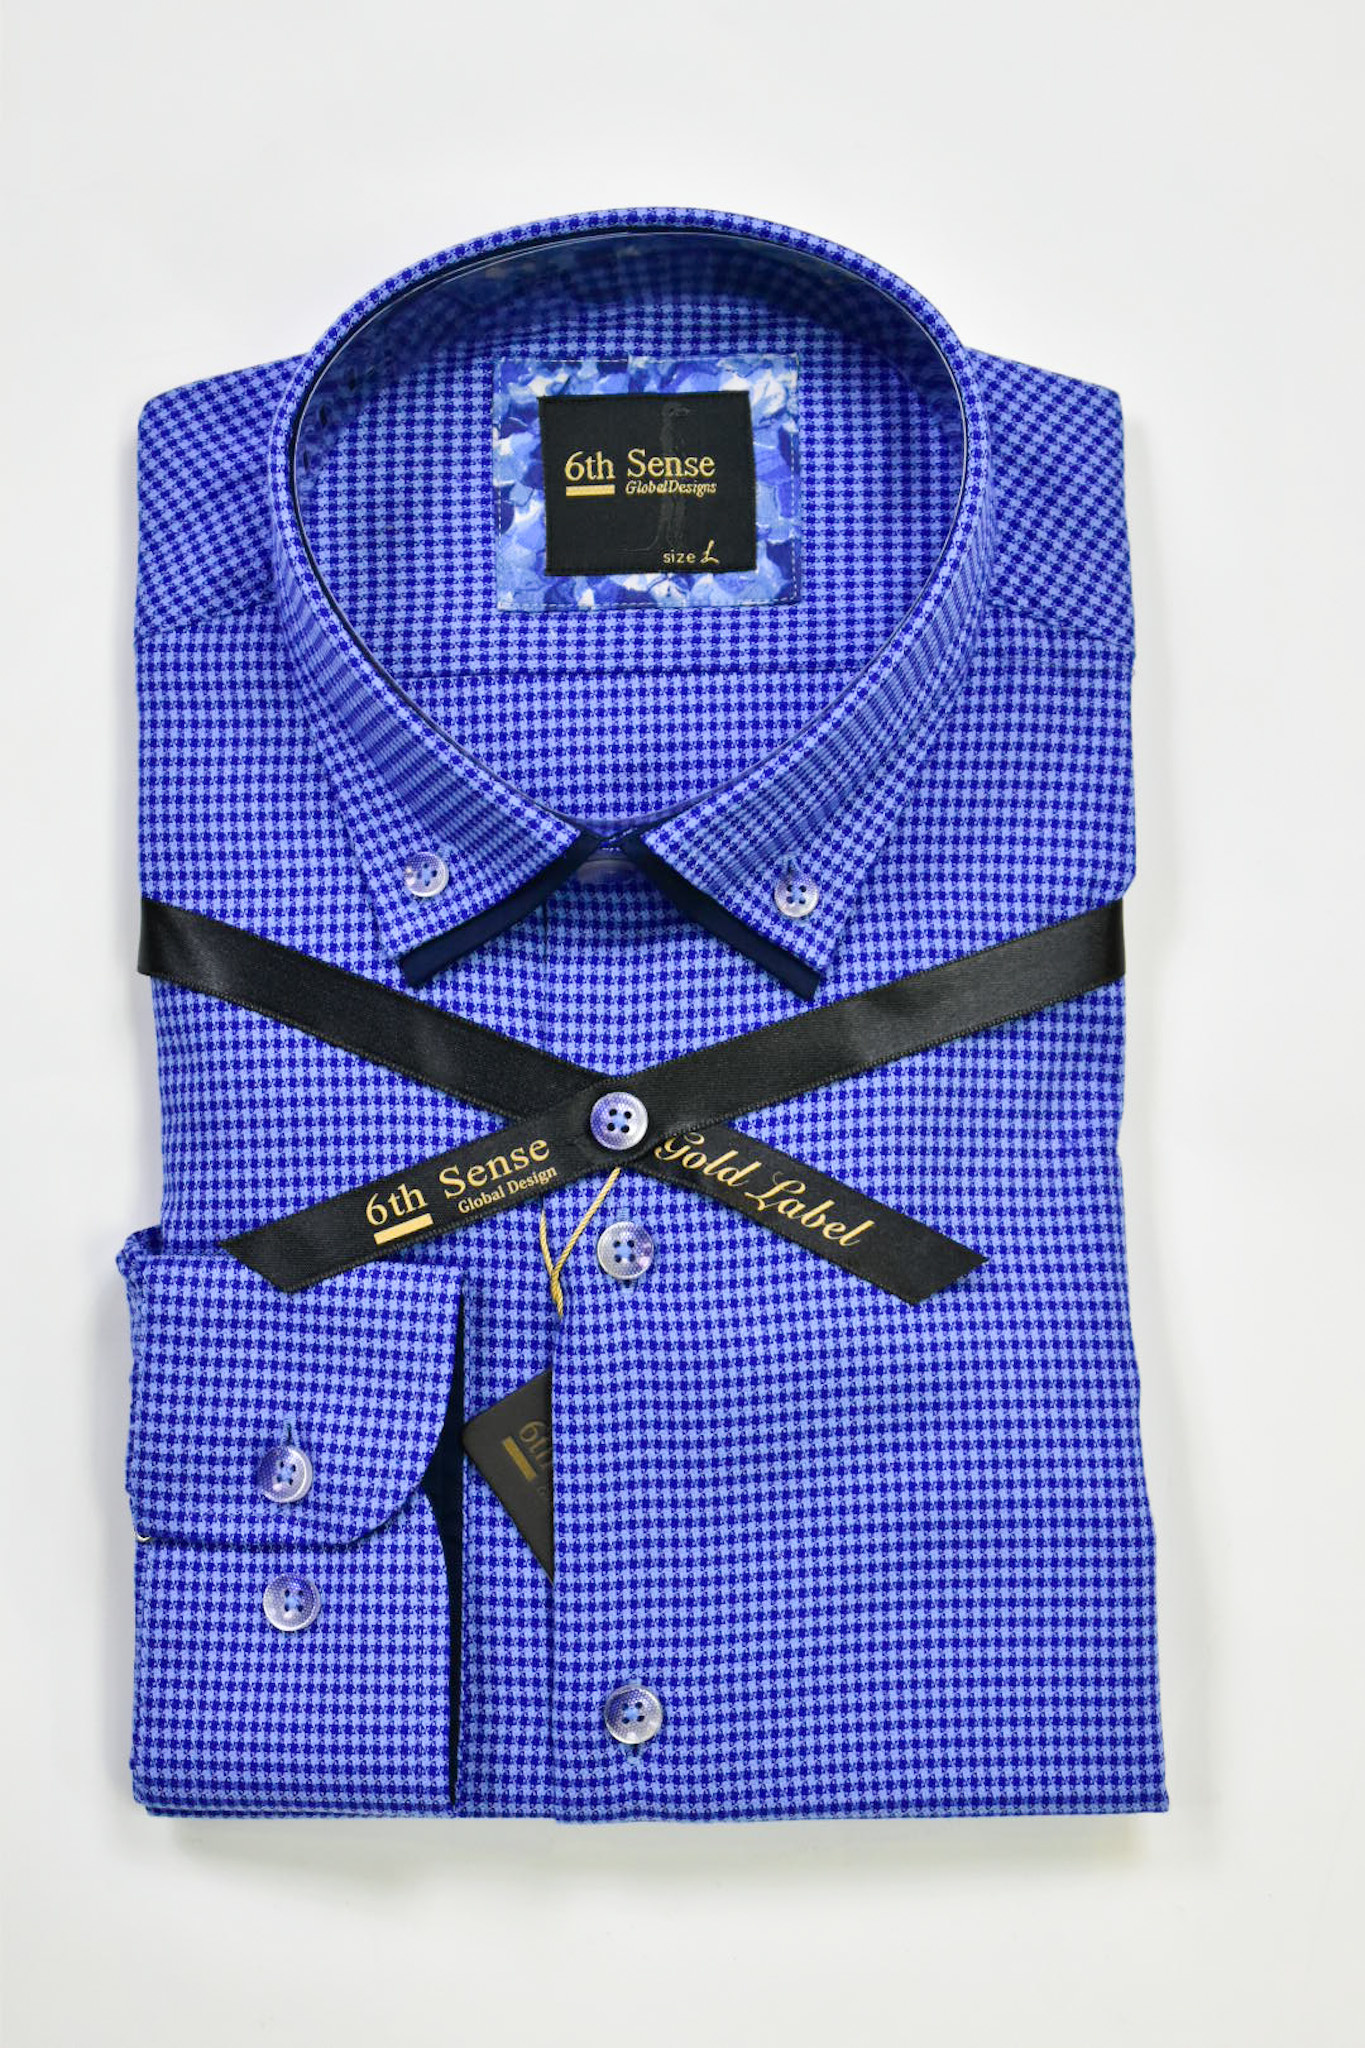 6th sense 201sc3 print shirt